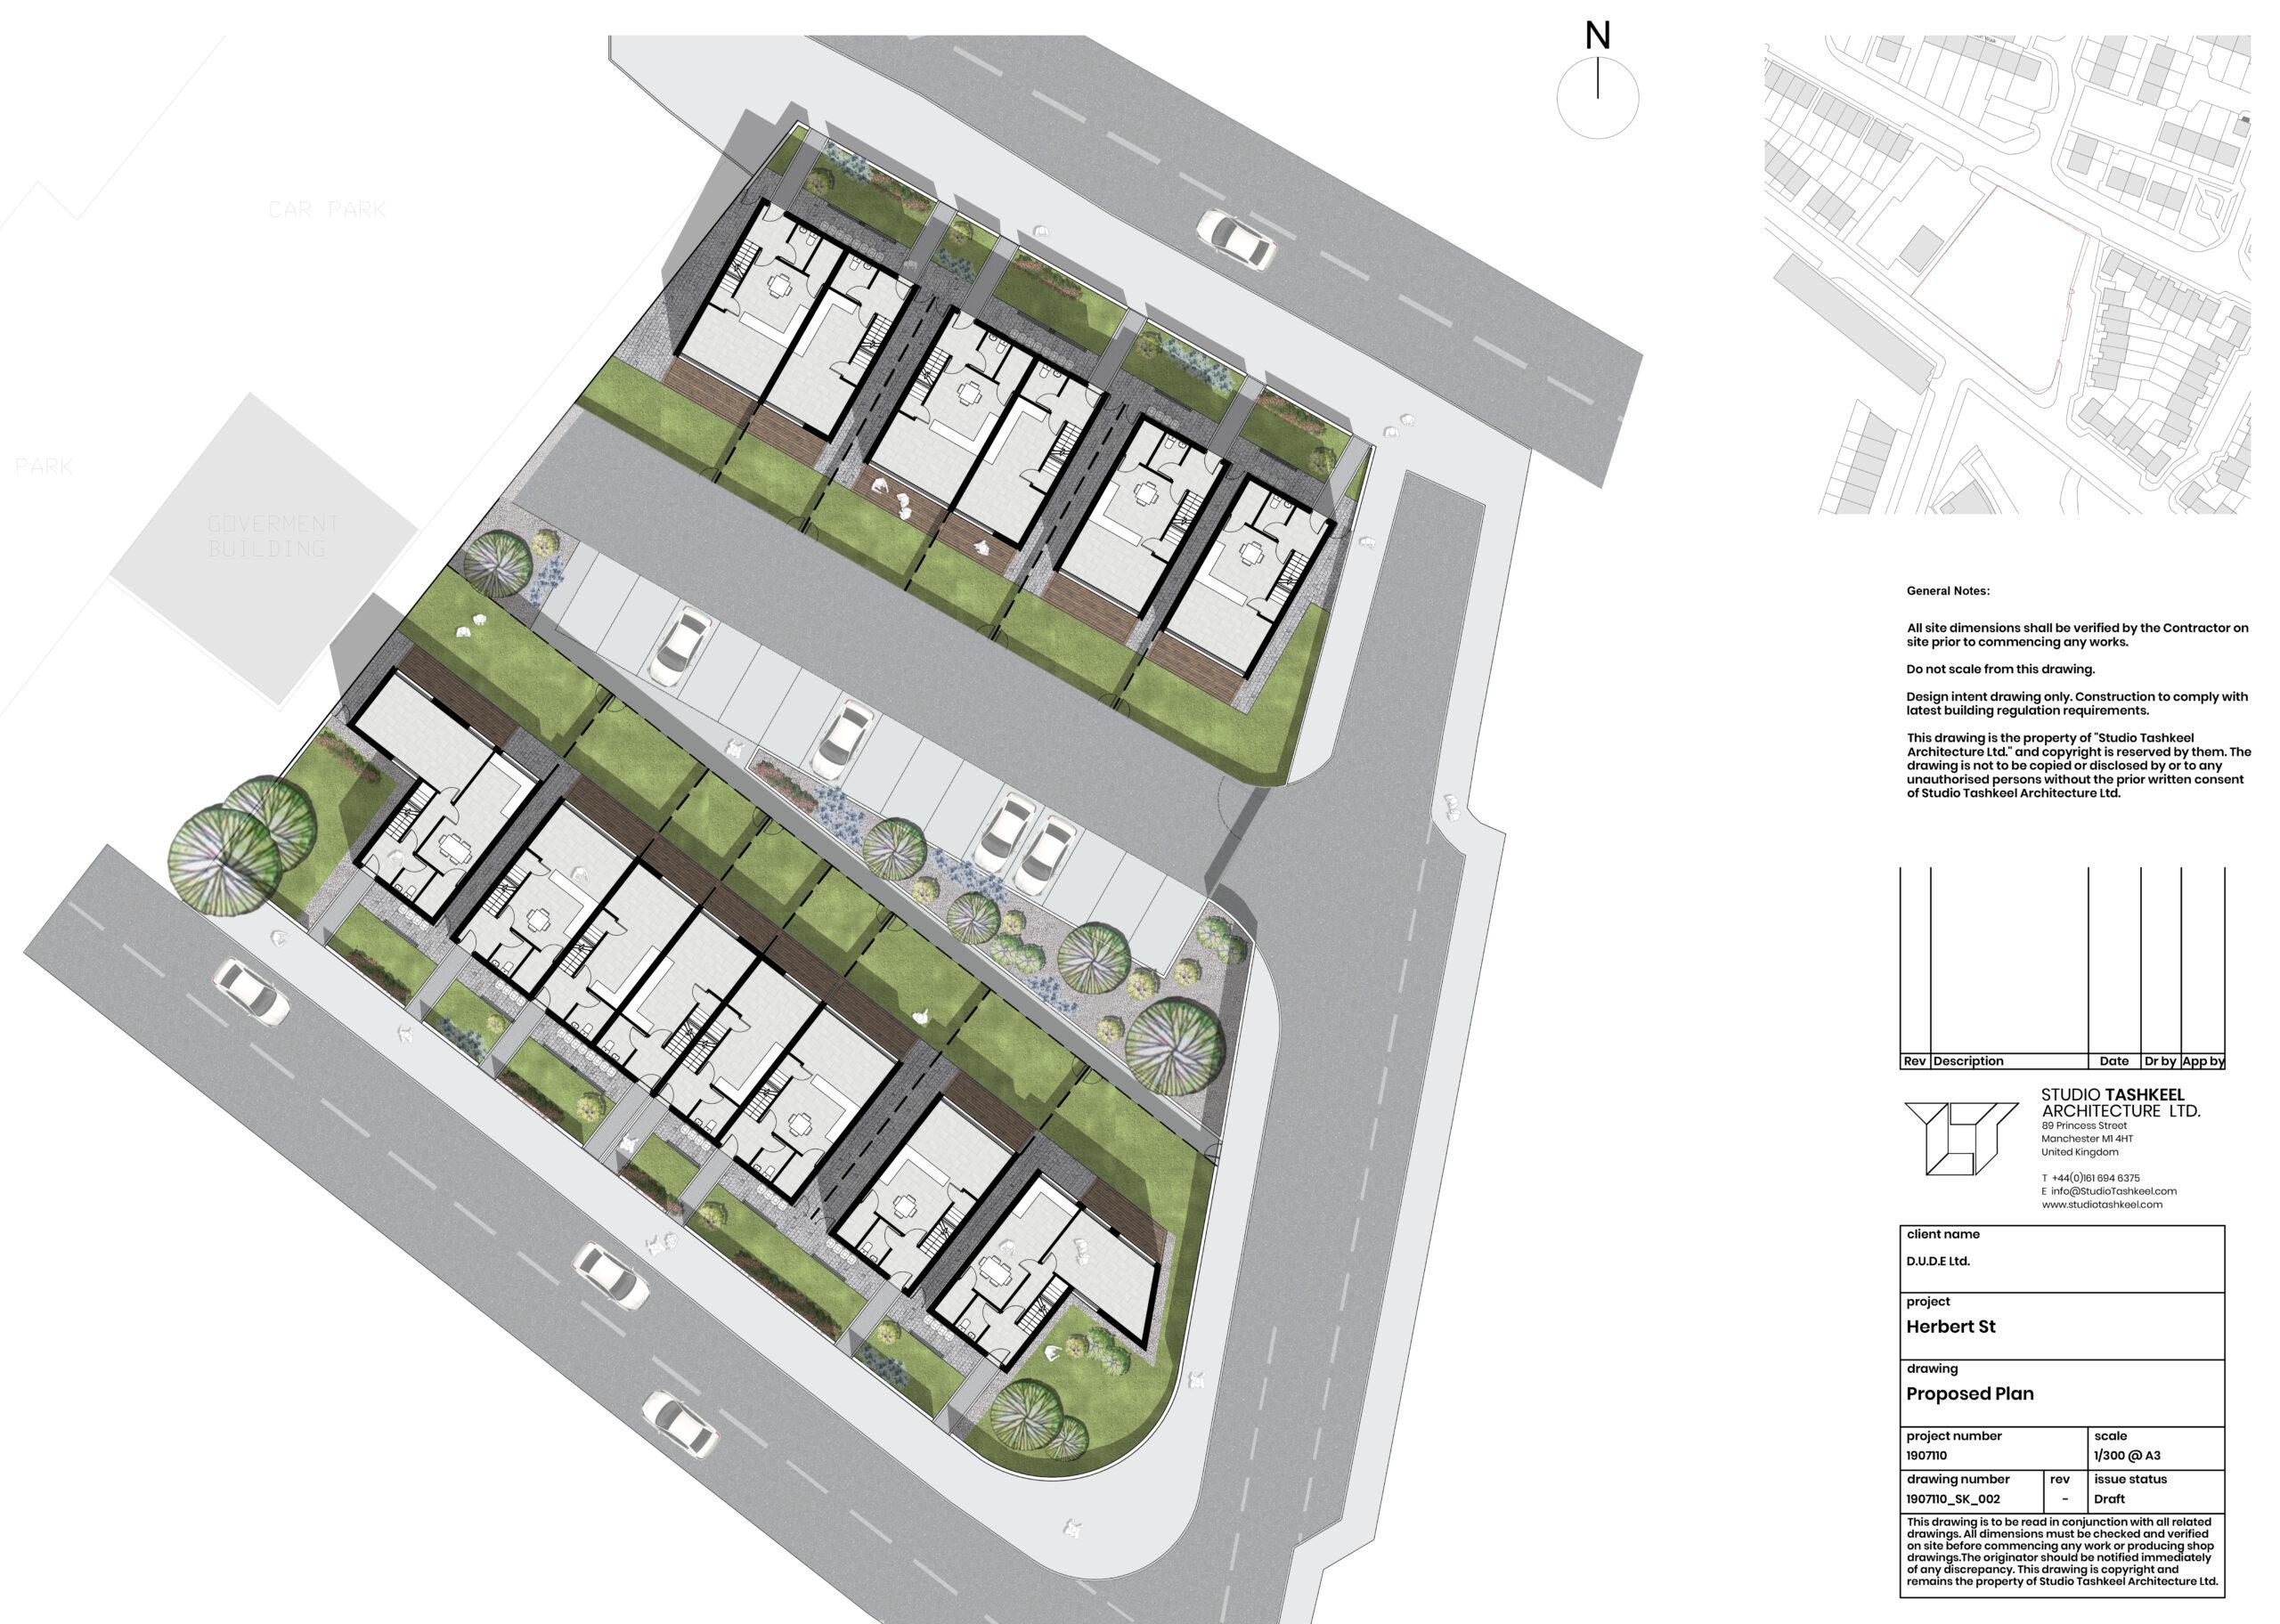 SK_002_Proposed Plan